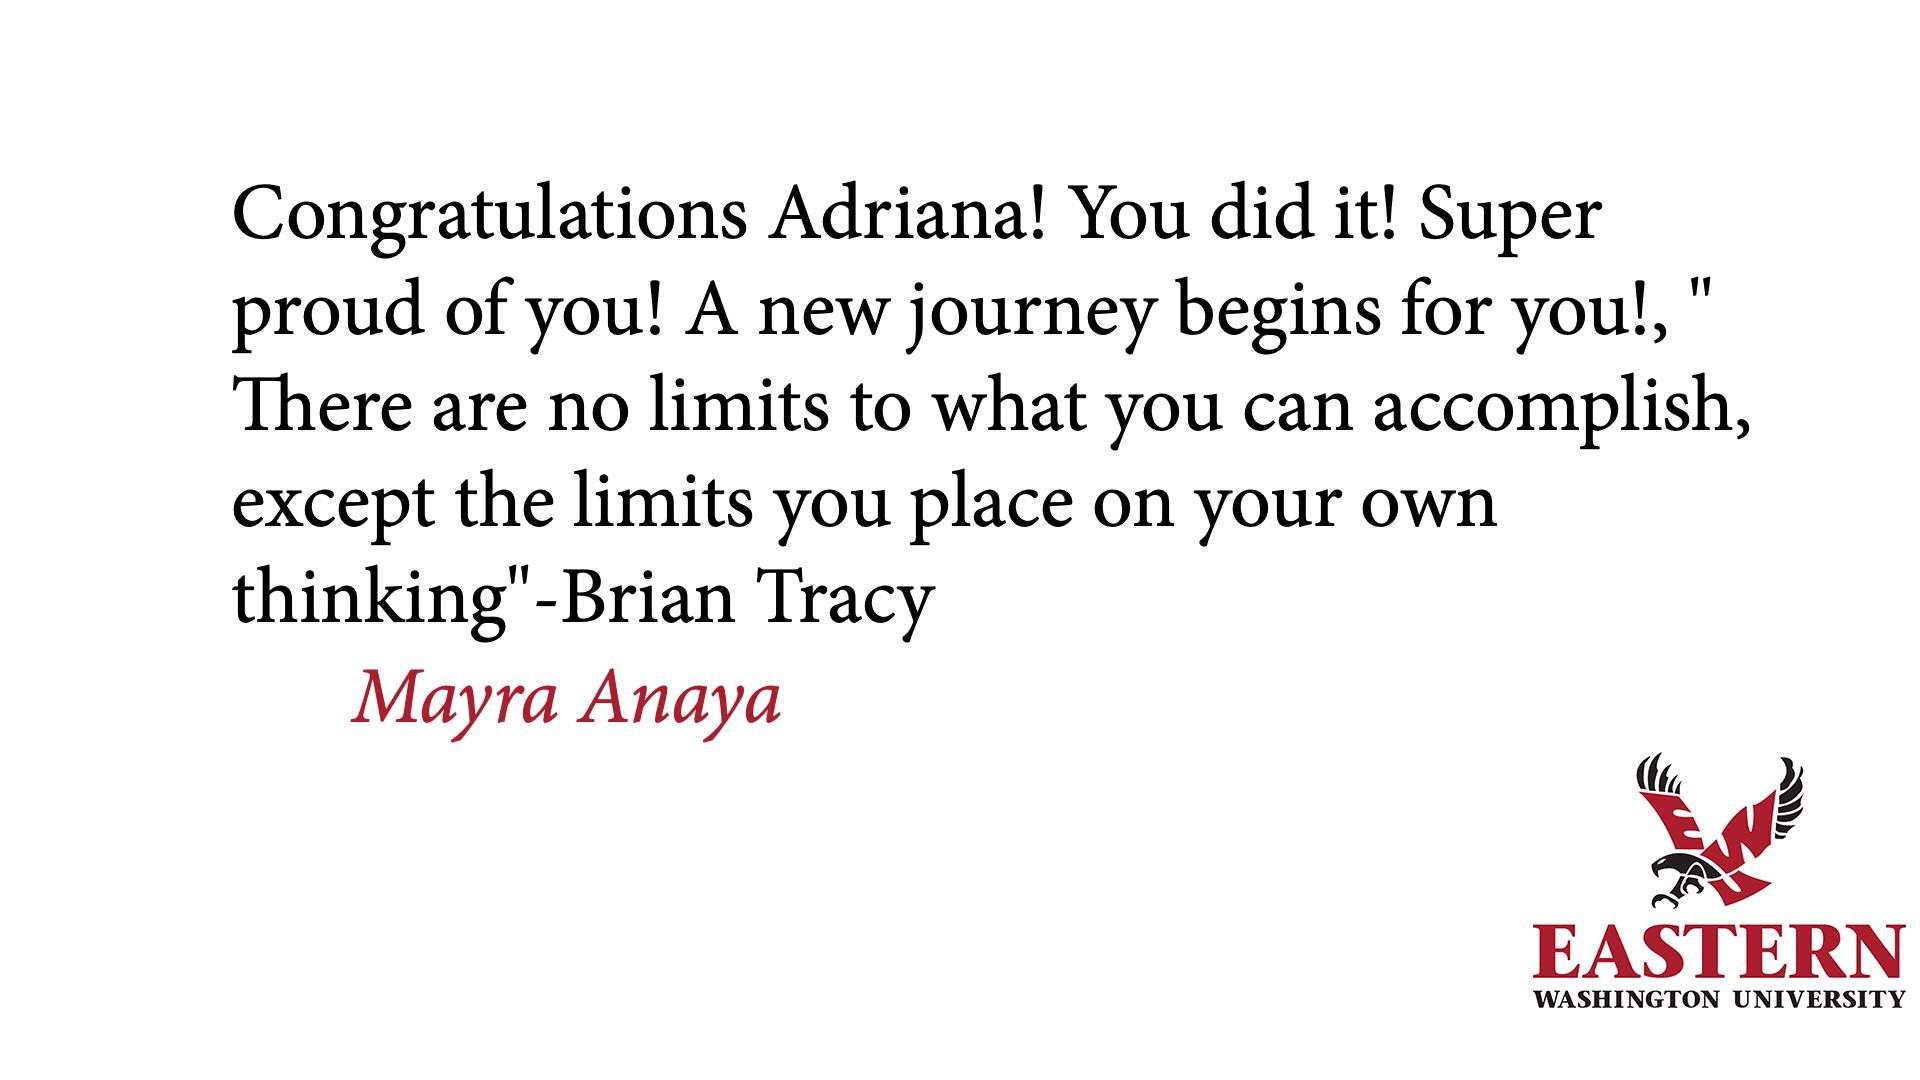 tbi_adriana-anaya_7897.png